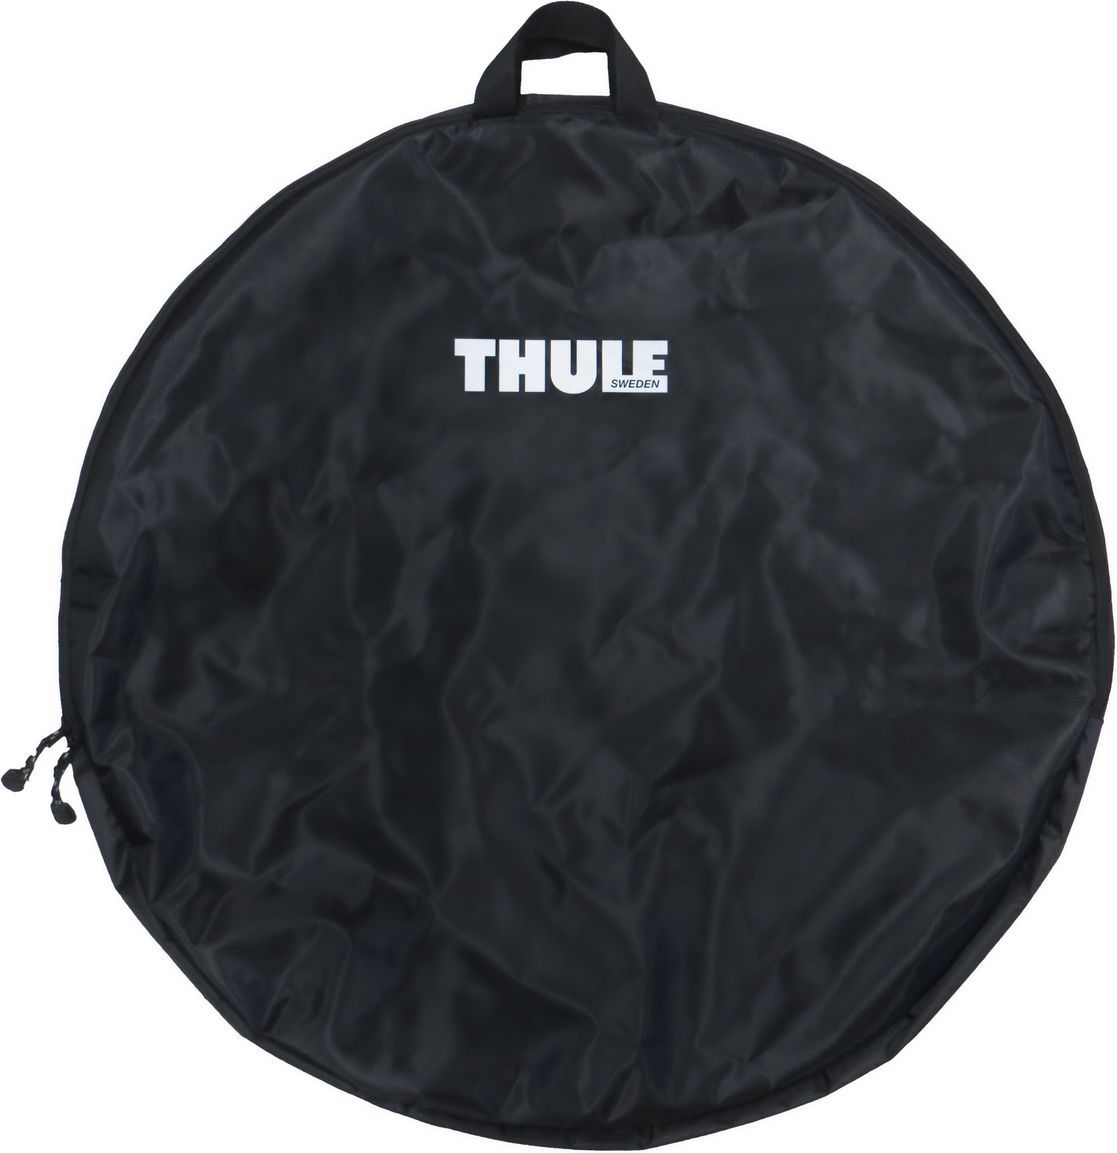 Чехол для велоколеса Thule, размер XL. 563 матин неопрена водонепроницаемый мягкий чехол для объектива камеры сумка размер sml xl